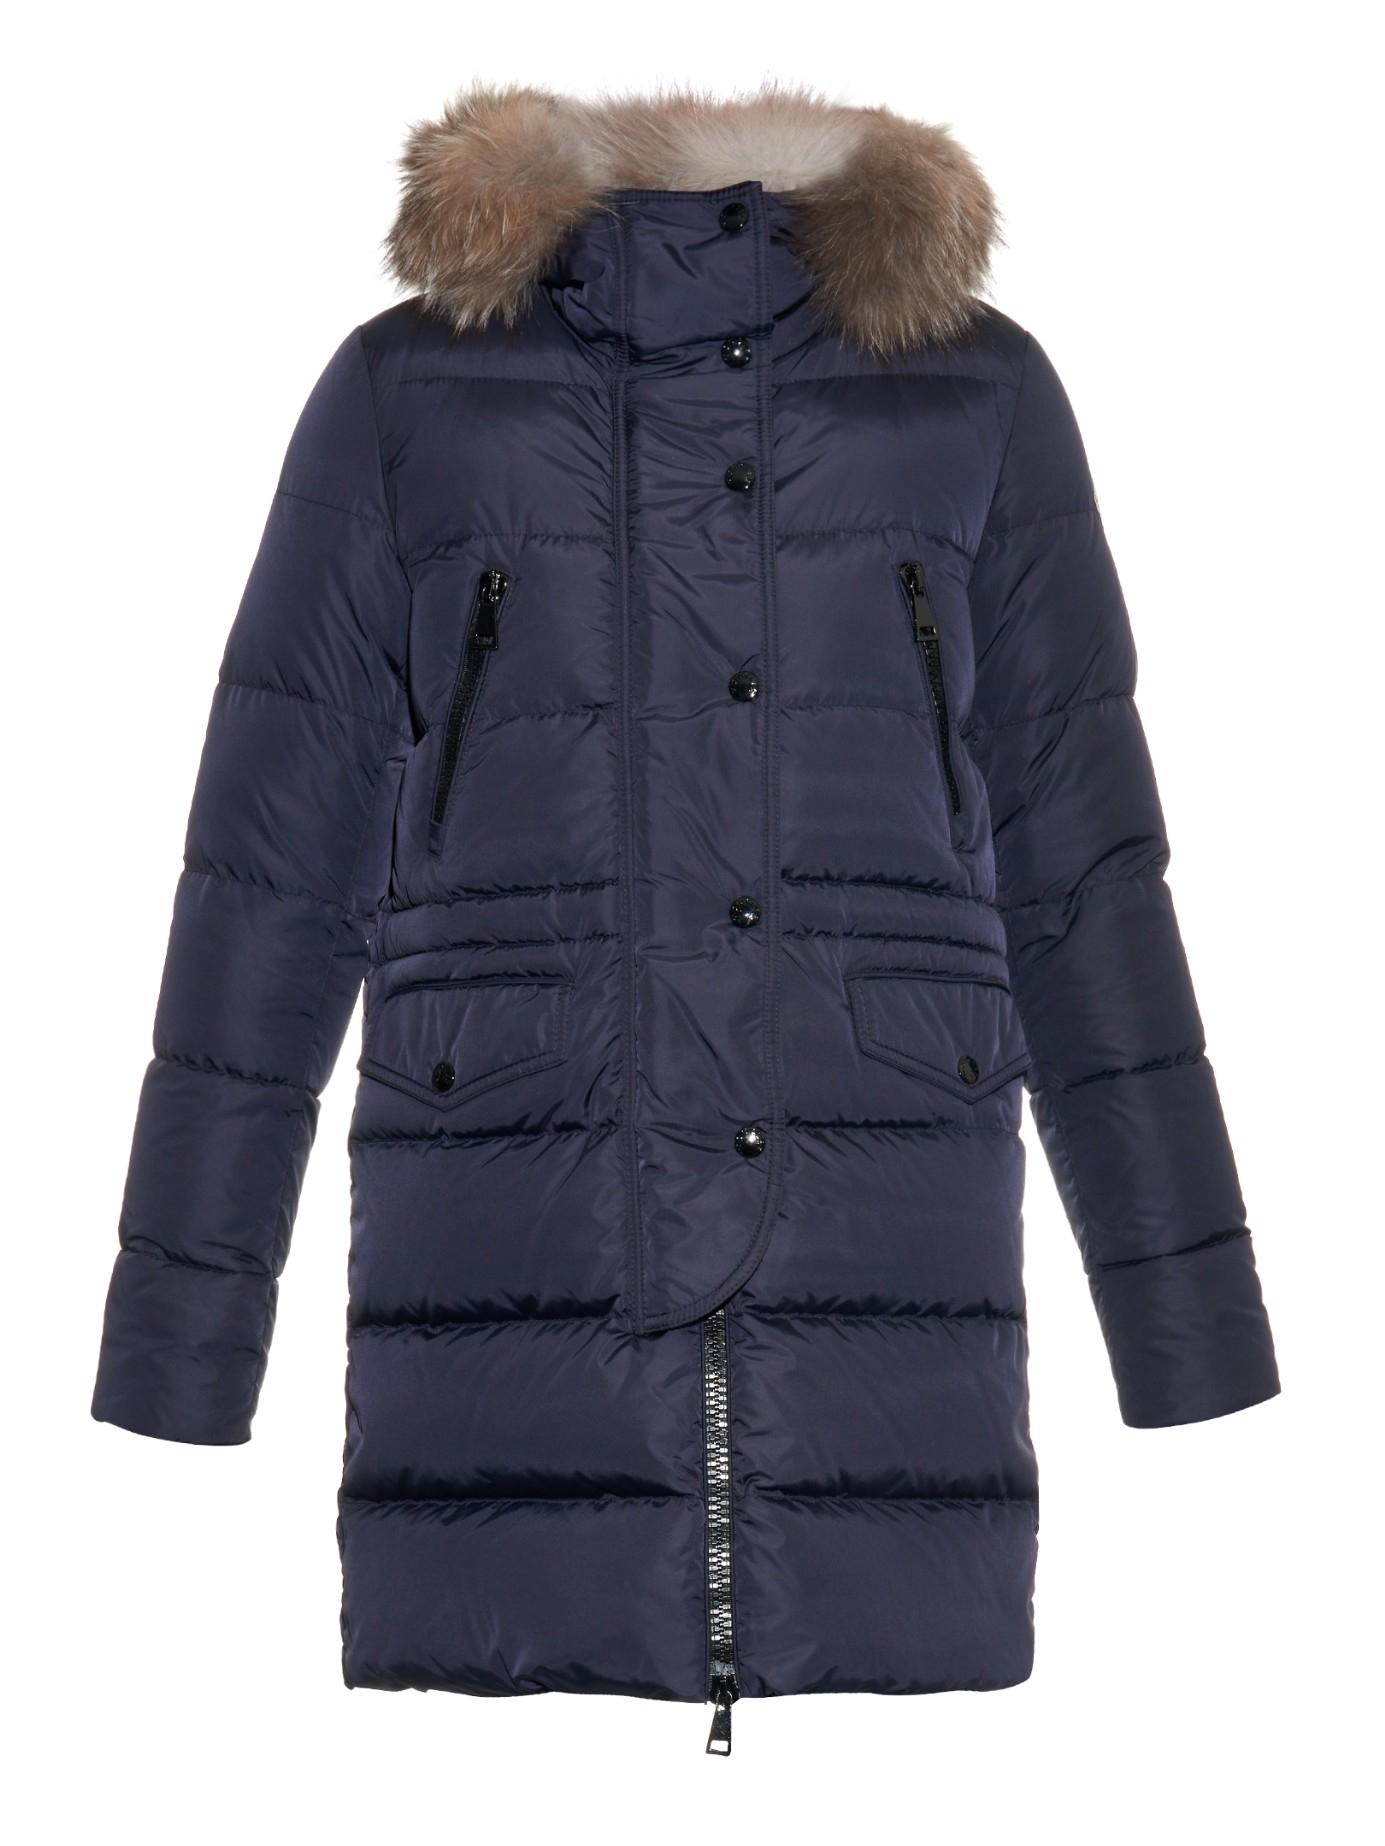 moncler fur trim coat